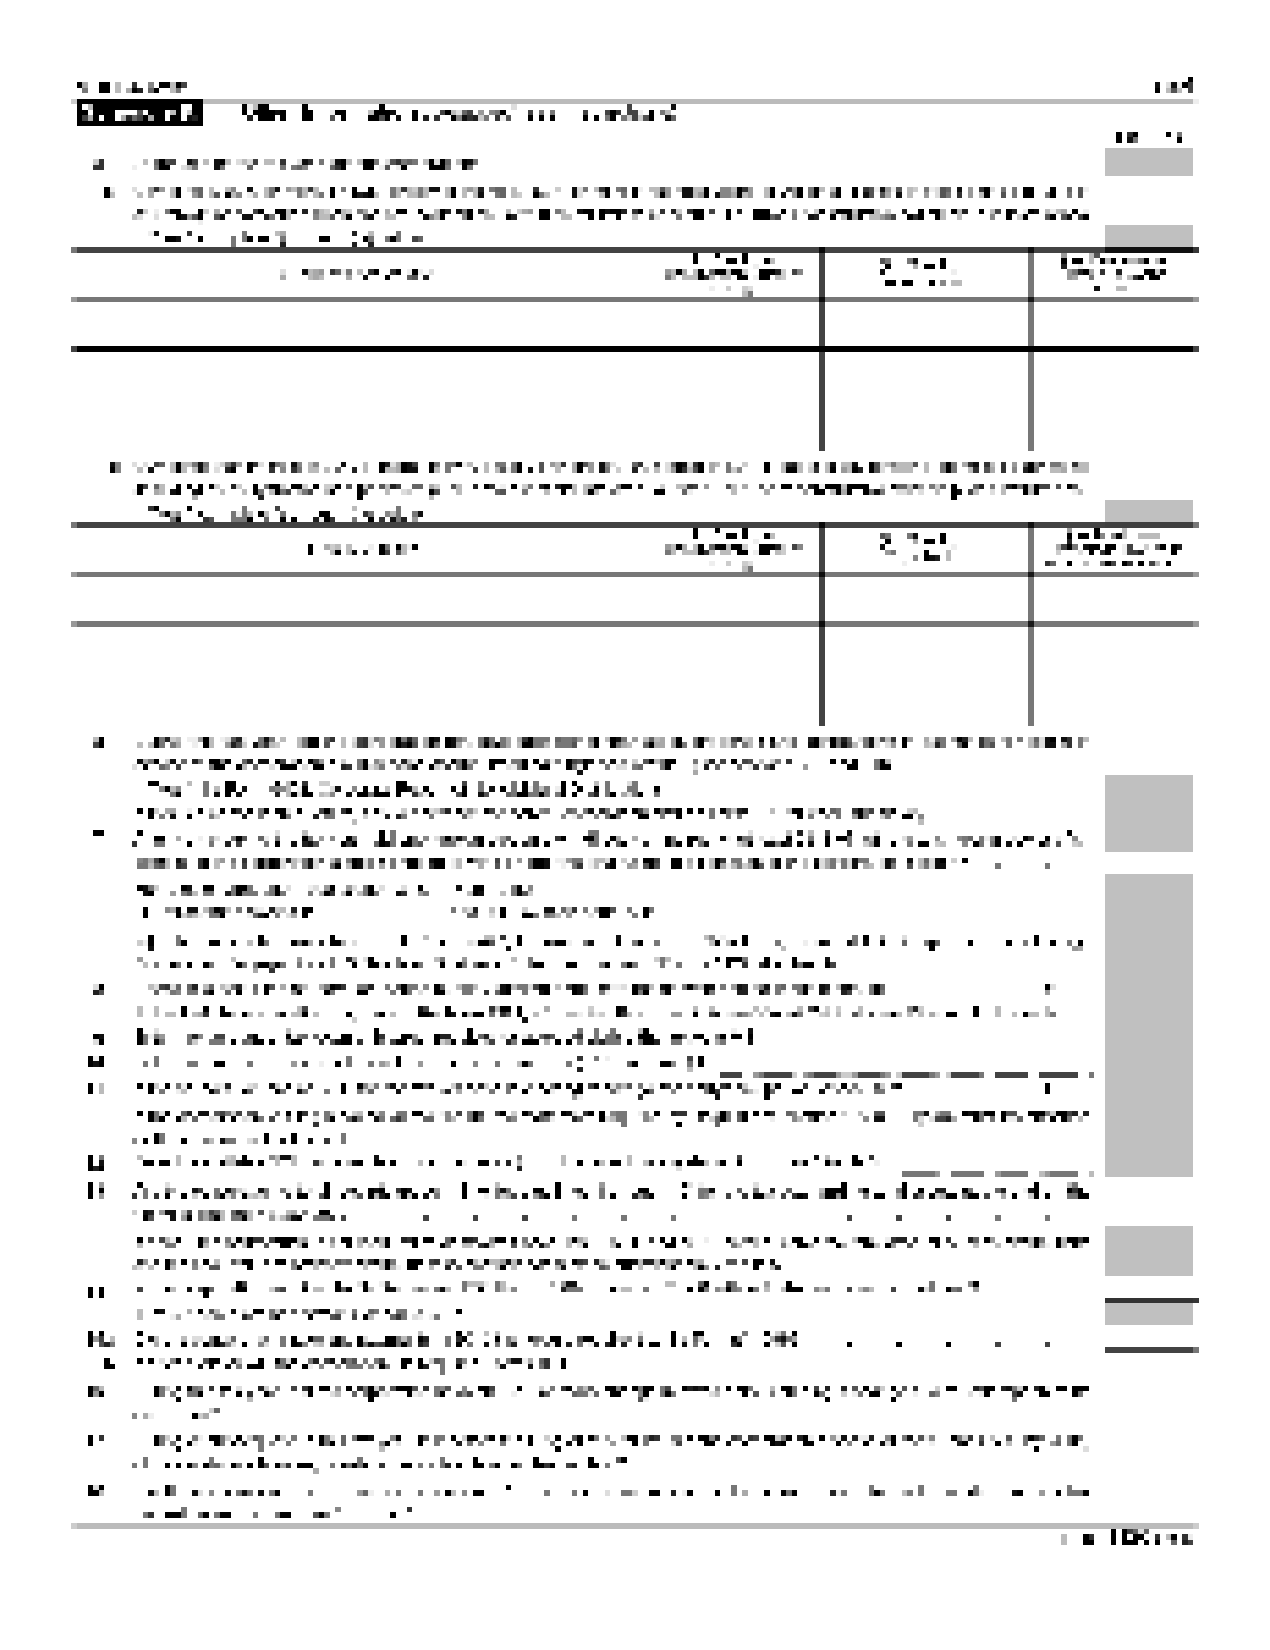 schedule c instructions 2015